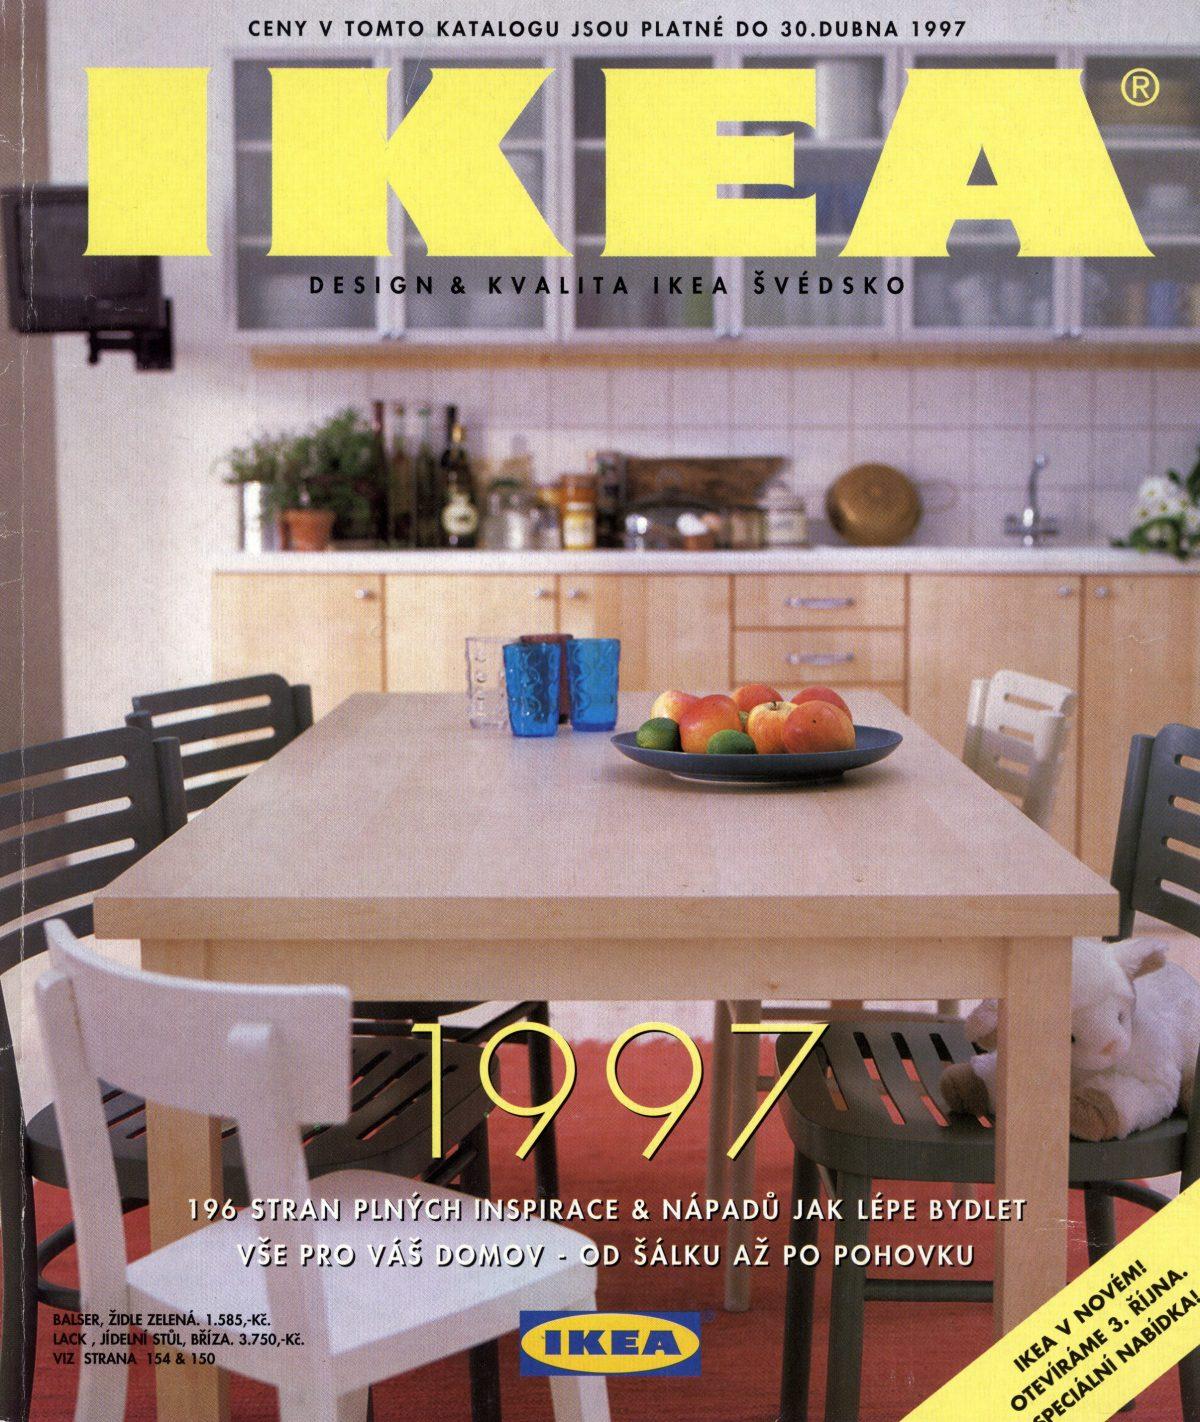 Katalog Ikea pro rok 1997